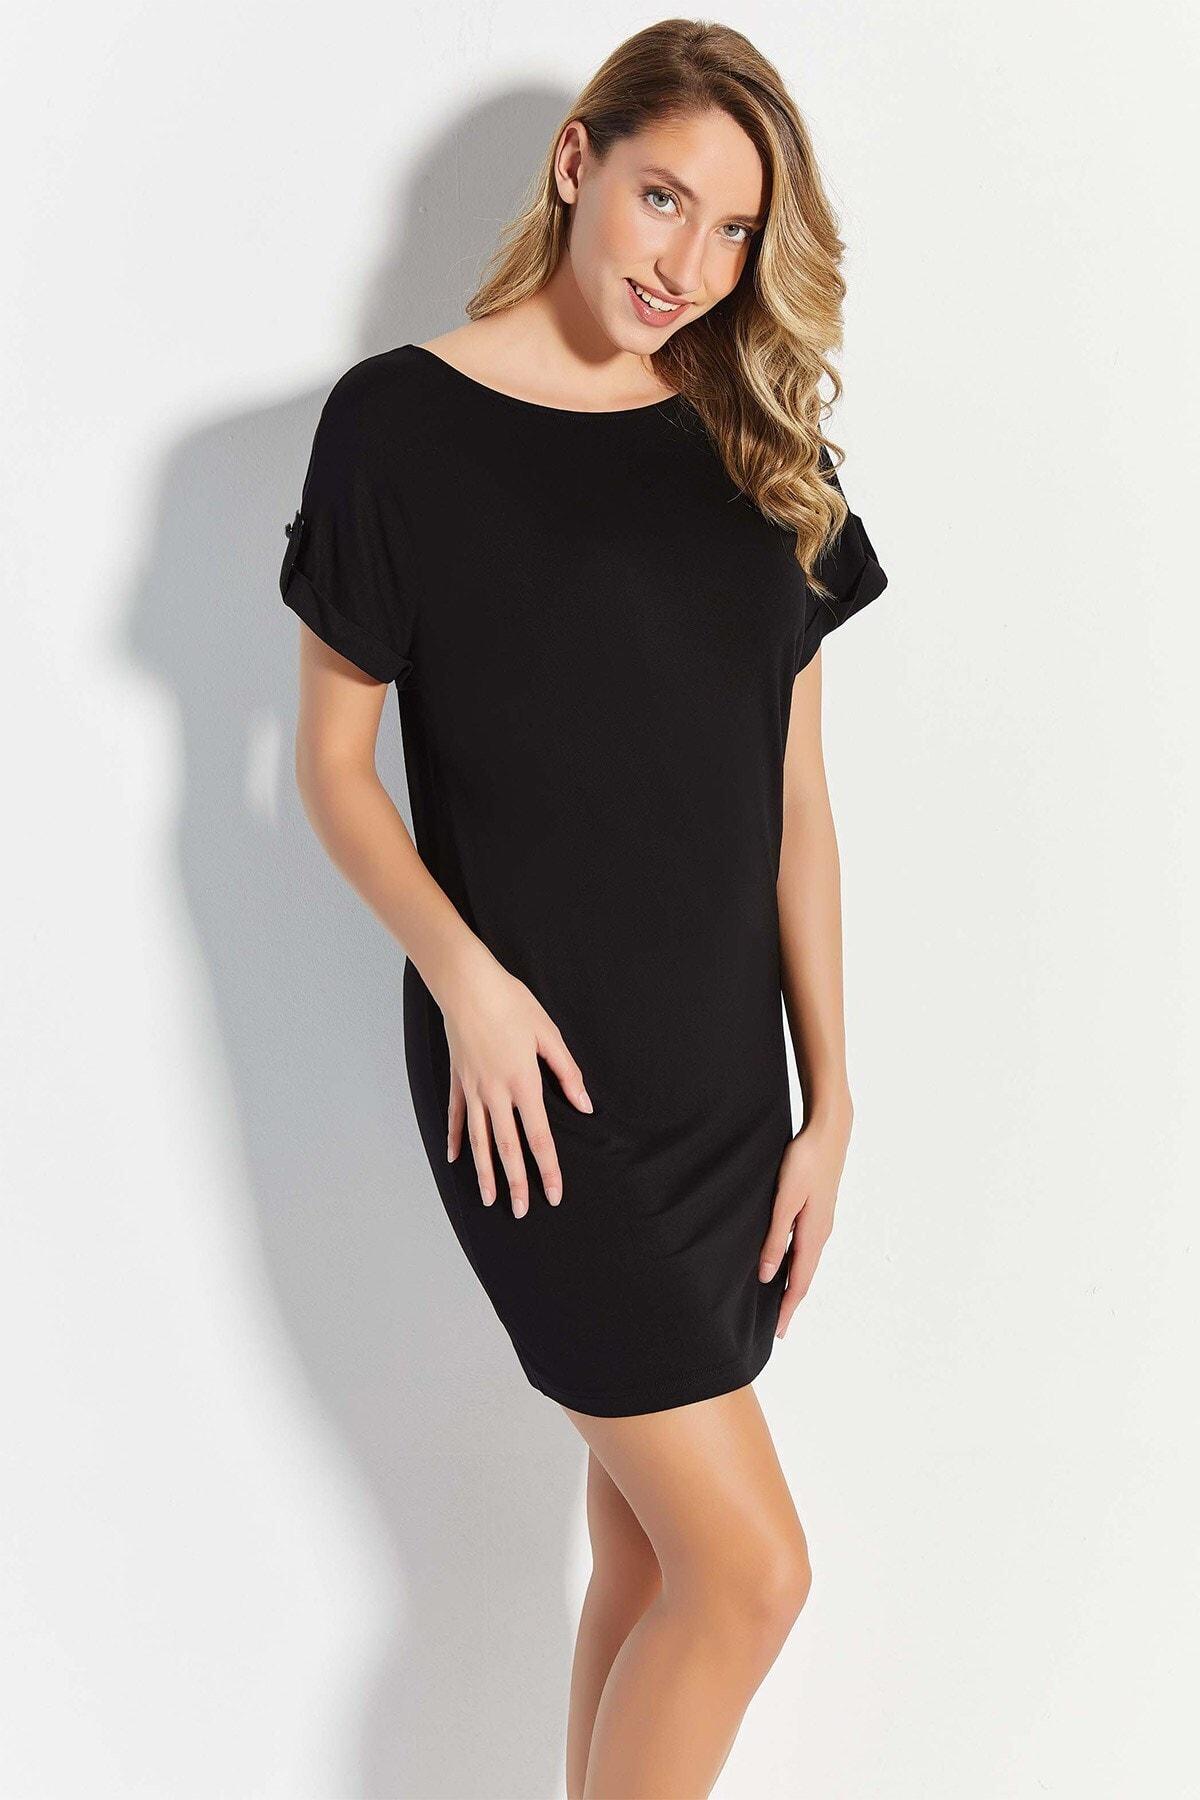 Lohusa Sepeti 20770 Siyah Geniş Yaka Sırt Detaylı Elbise 1